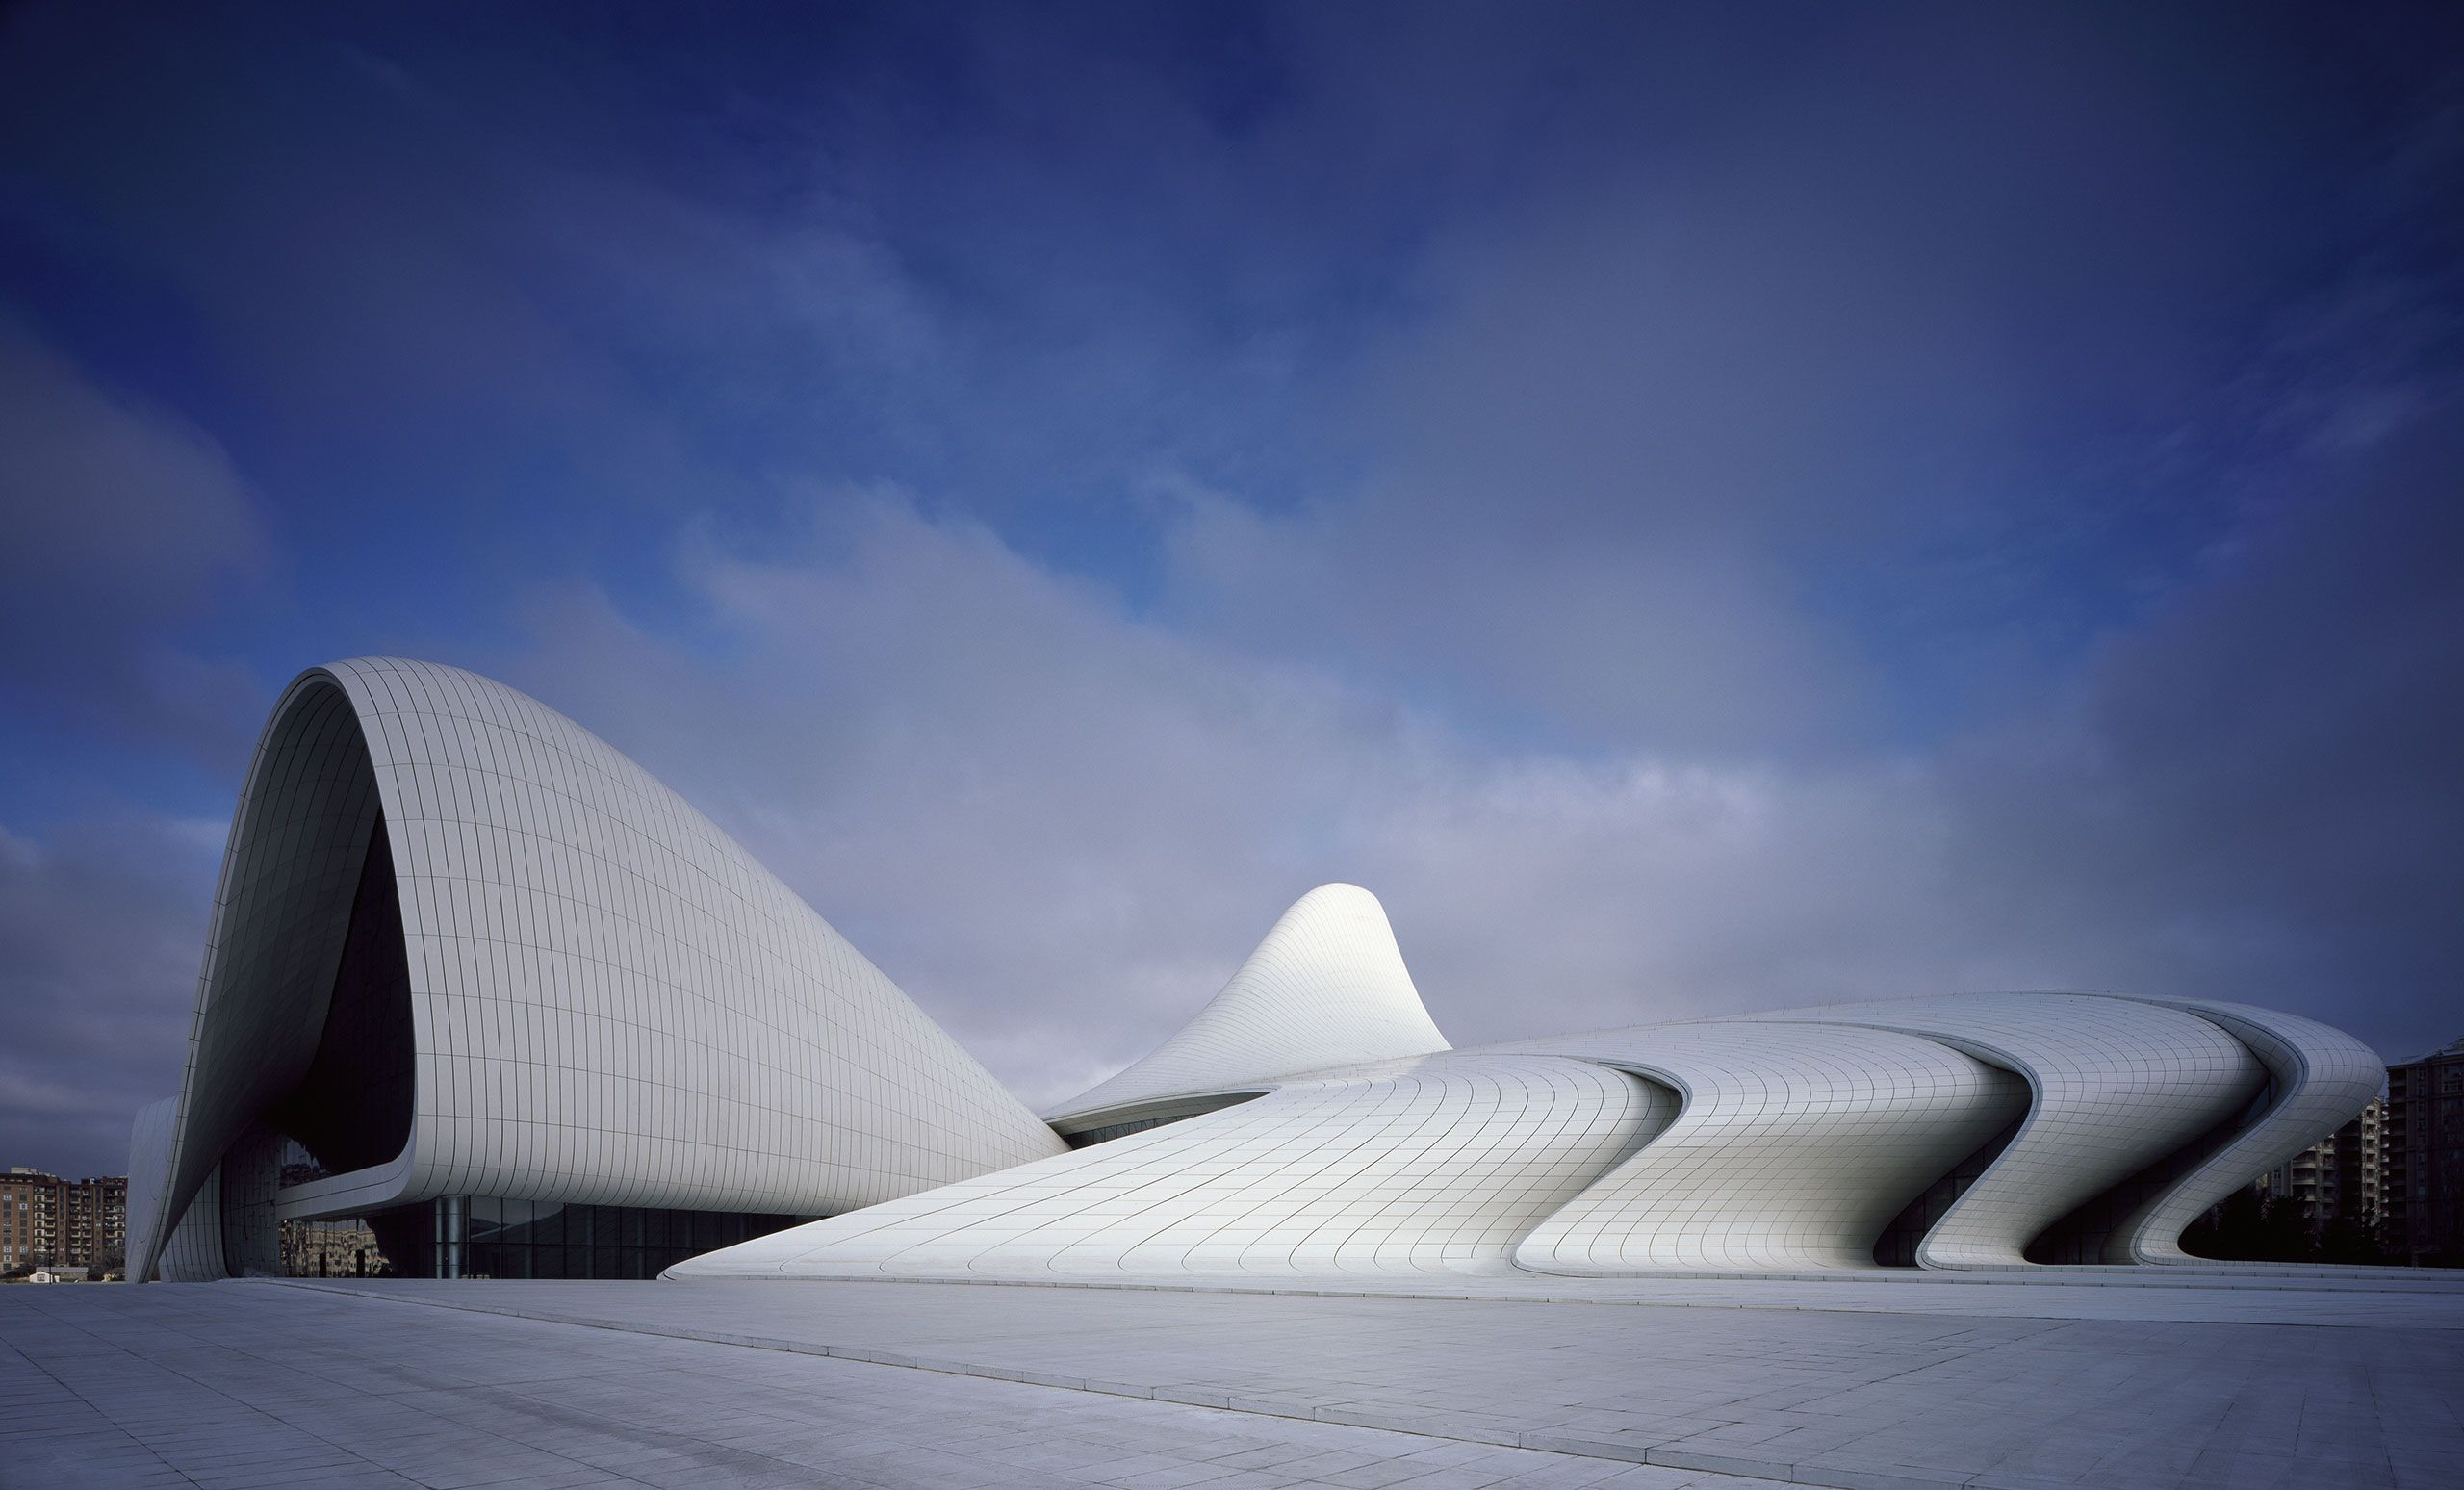 The Heydar Aliyev Center By Zaha Hadid Architects In Baku Azerbaijan Yatzer Zaha Hadid Design Zaha Hadid Architects Zaha Hadid Buildings